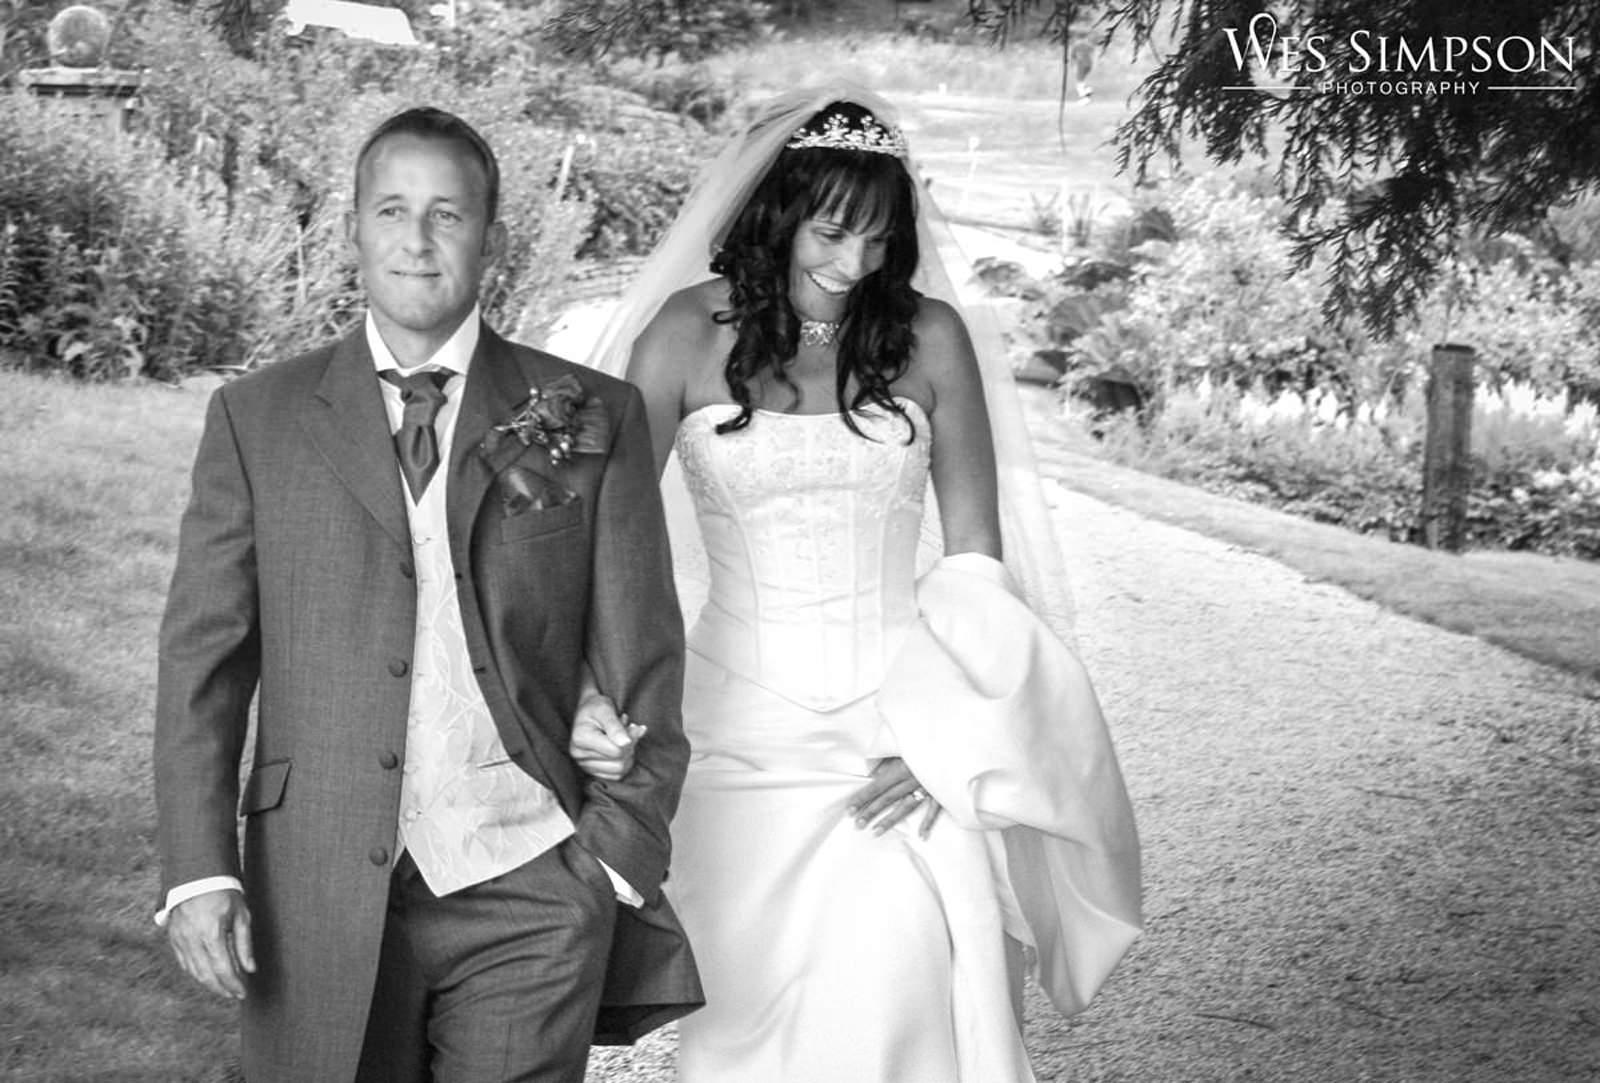 Wes Simpson 1st wedding at Lange Dale Chase lake District